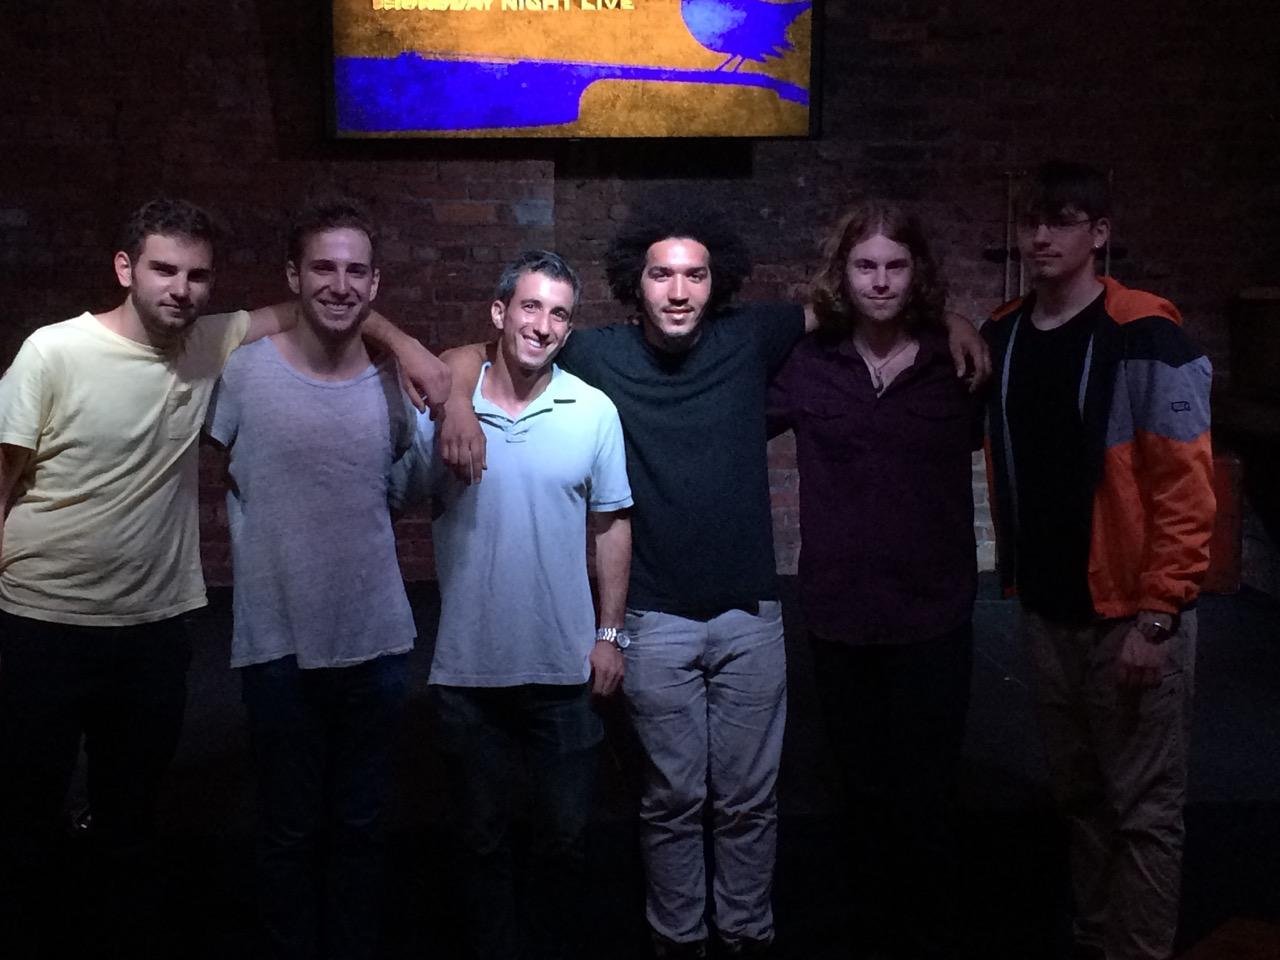 Left to right: Eric Pubins, Luke Lotardo, Jason Melker, Dud Music, Perry Ladouceur, Eric Milton